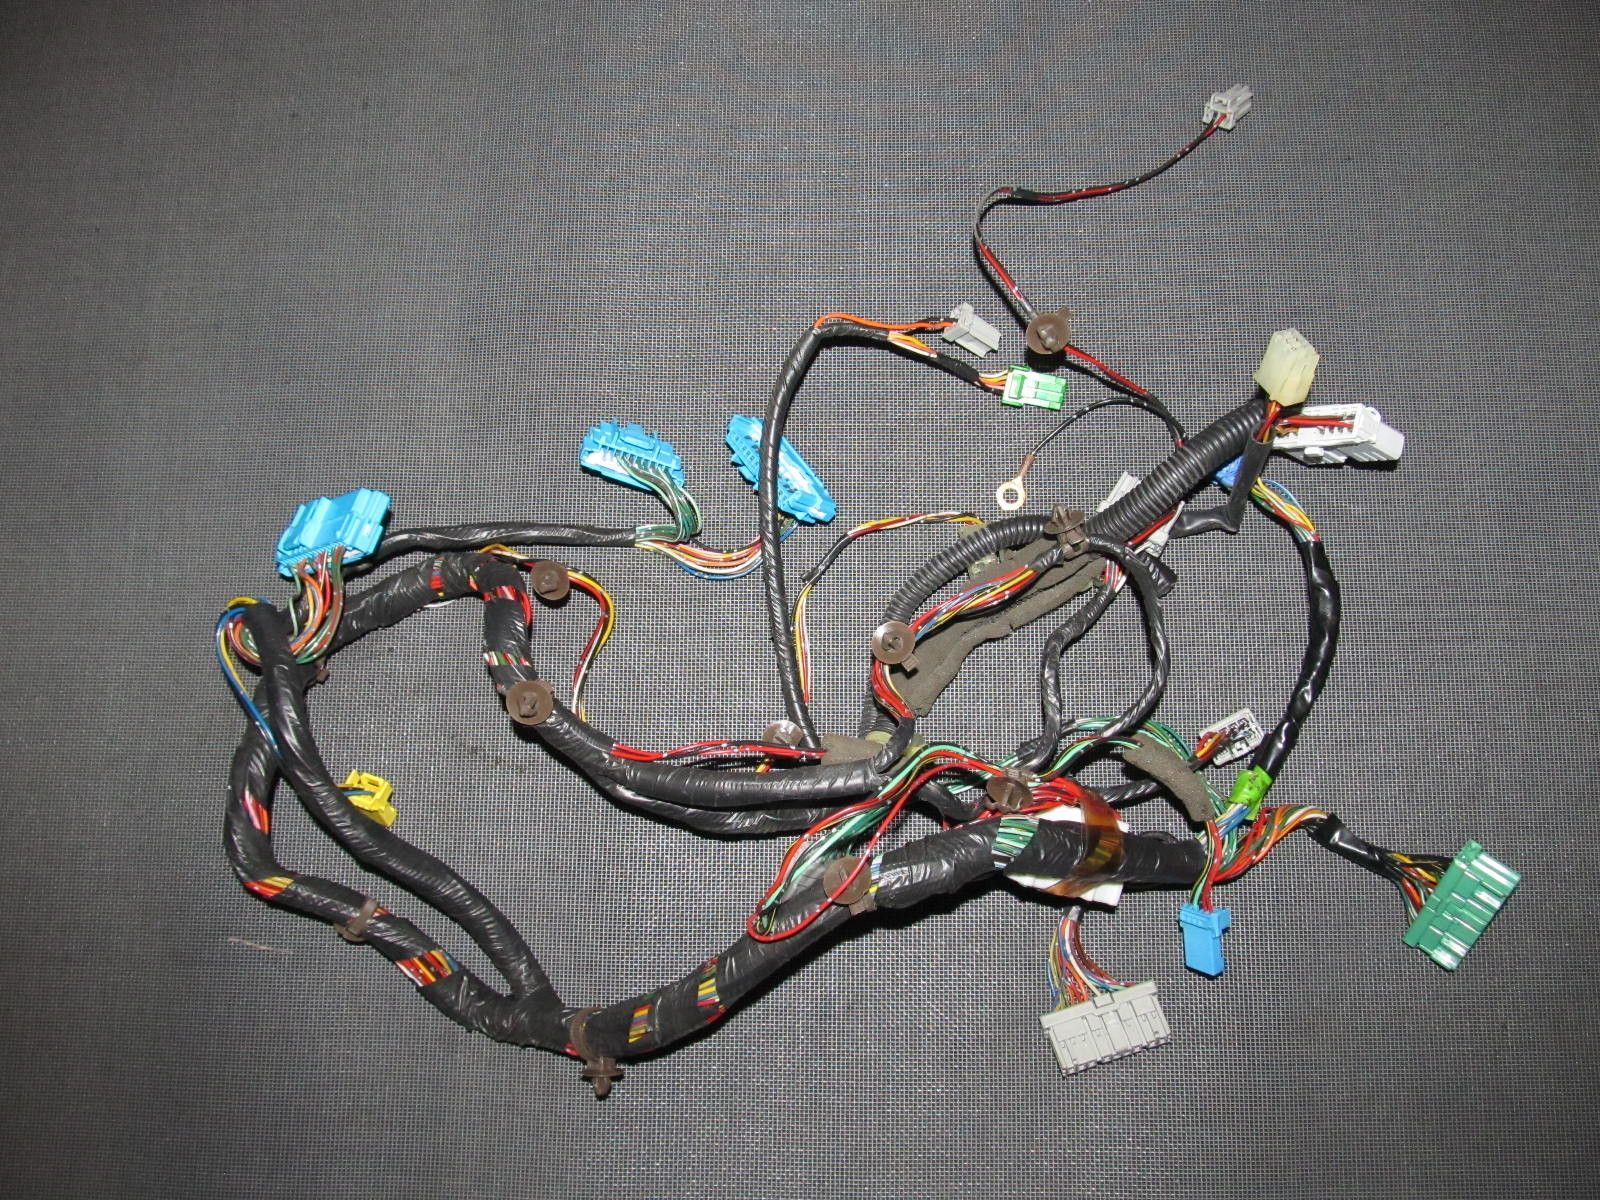 94 01 acura integra oem speedometer wiring harness [ 1600 x 1200 Pixel ]